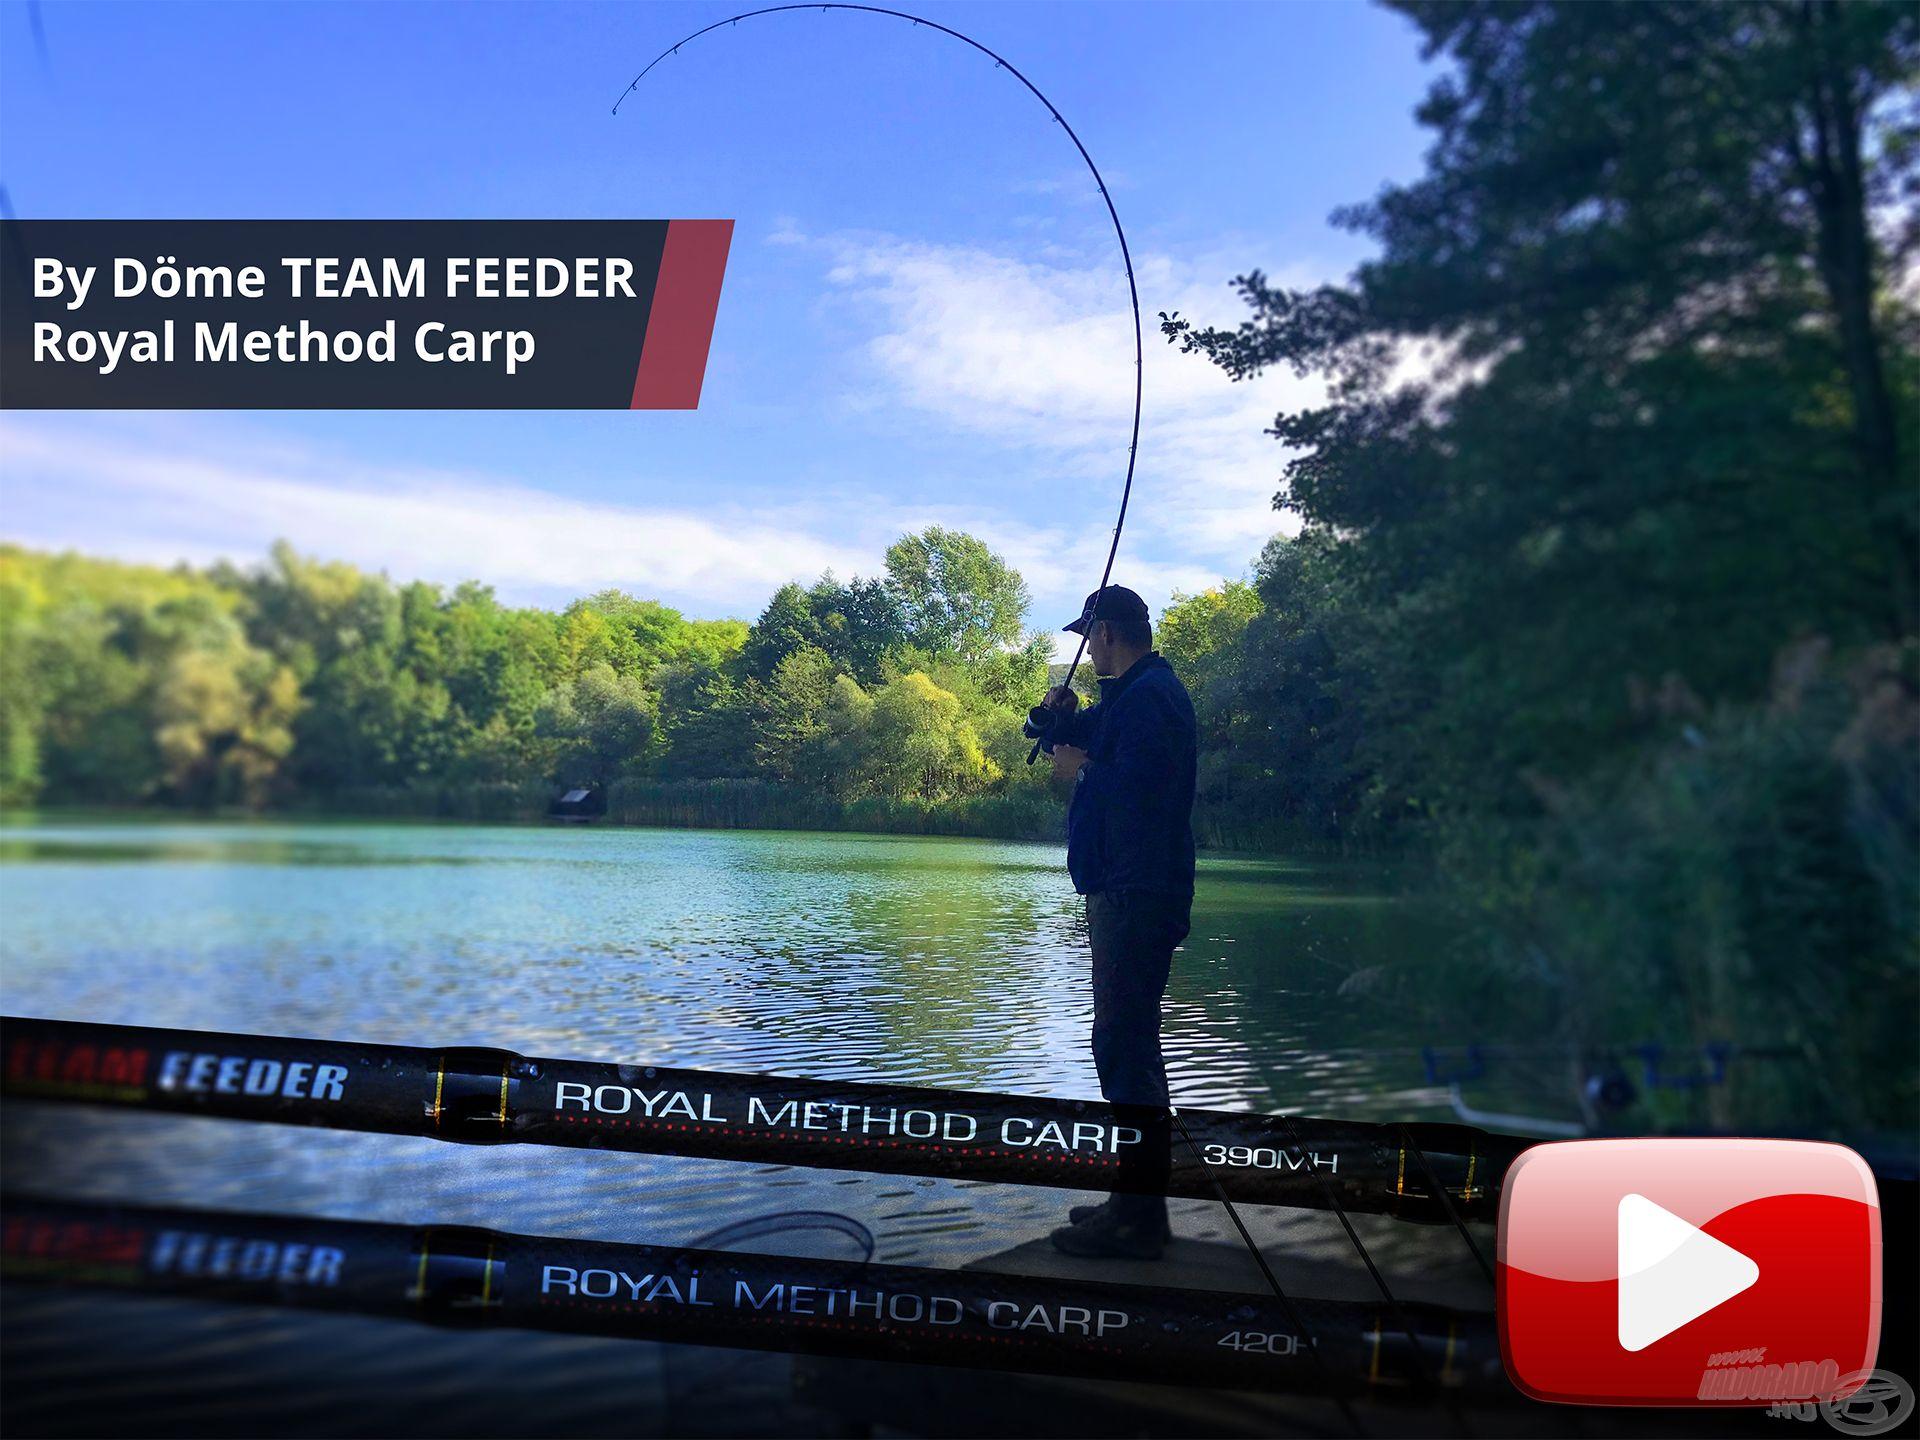 Akcióban a By Döme TEAM FEEDER Royal Method Carp feederbot 1. rész